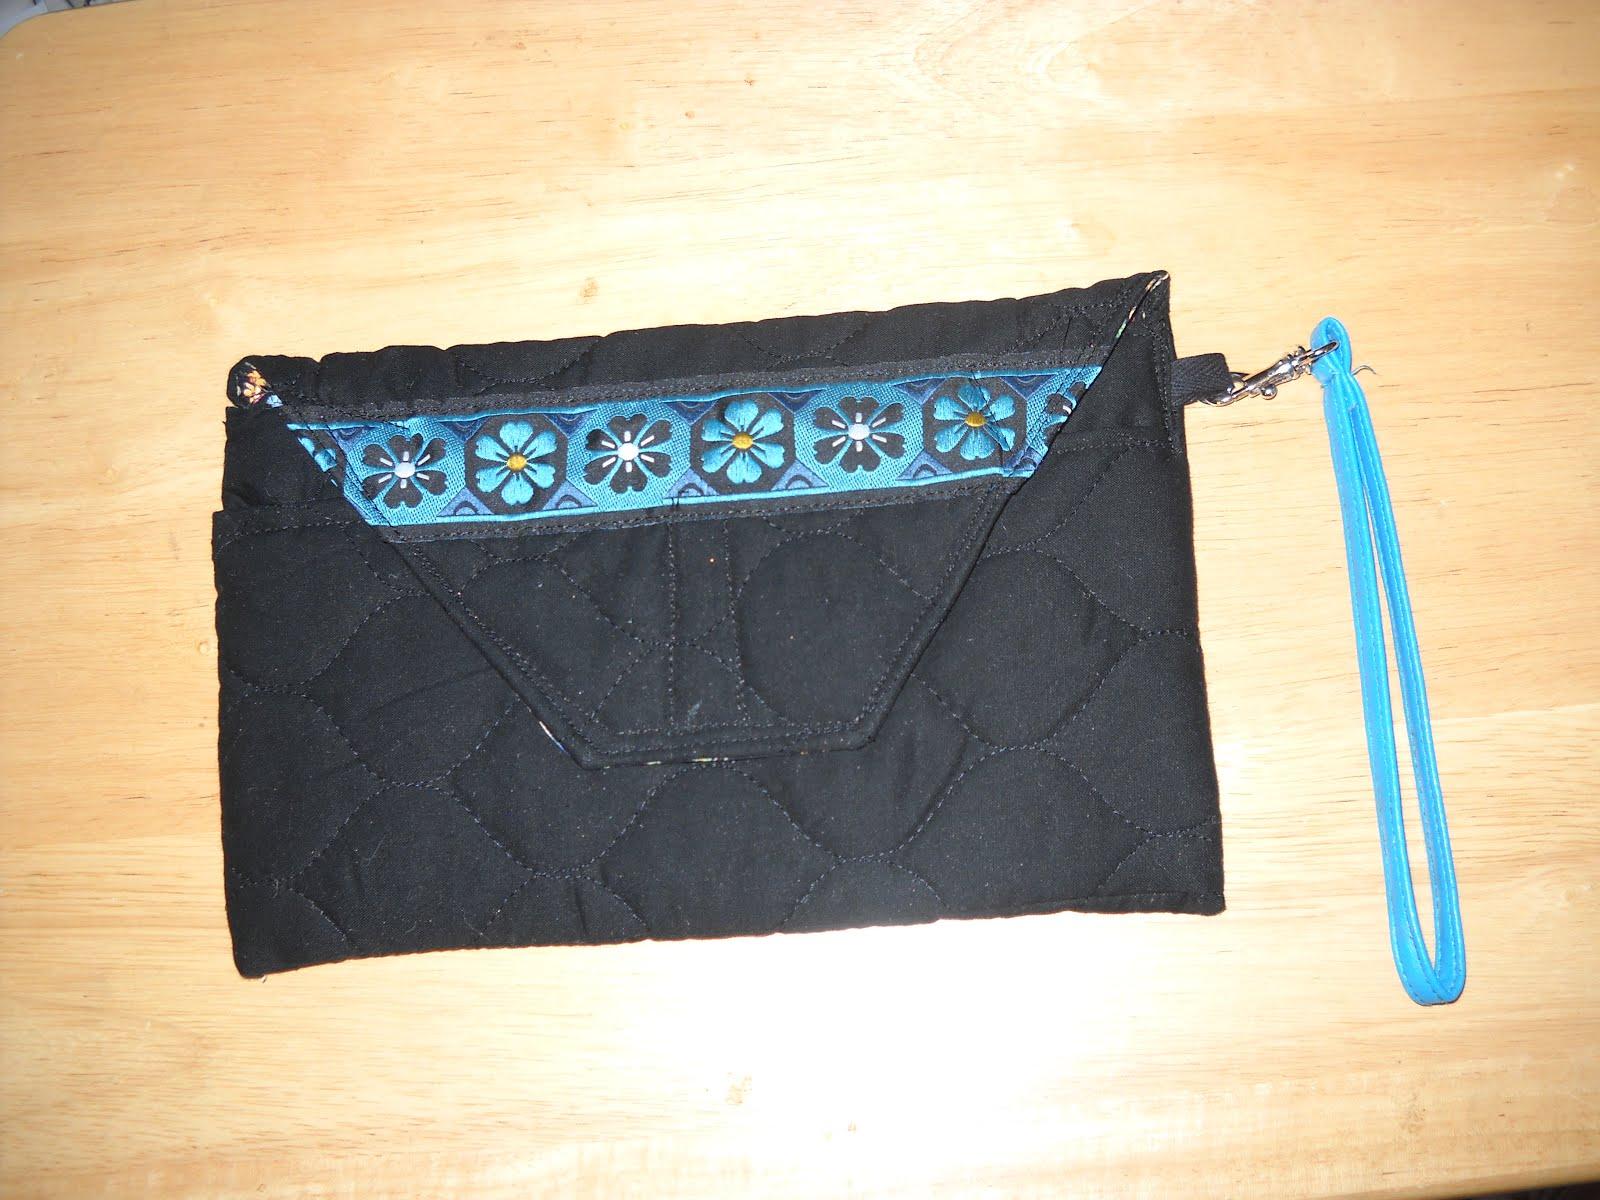 Black and Teal Braid Clutch